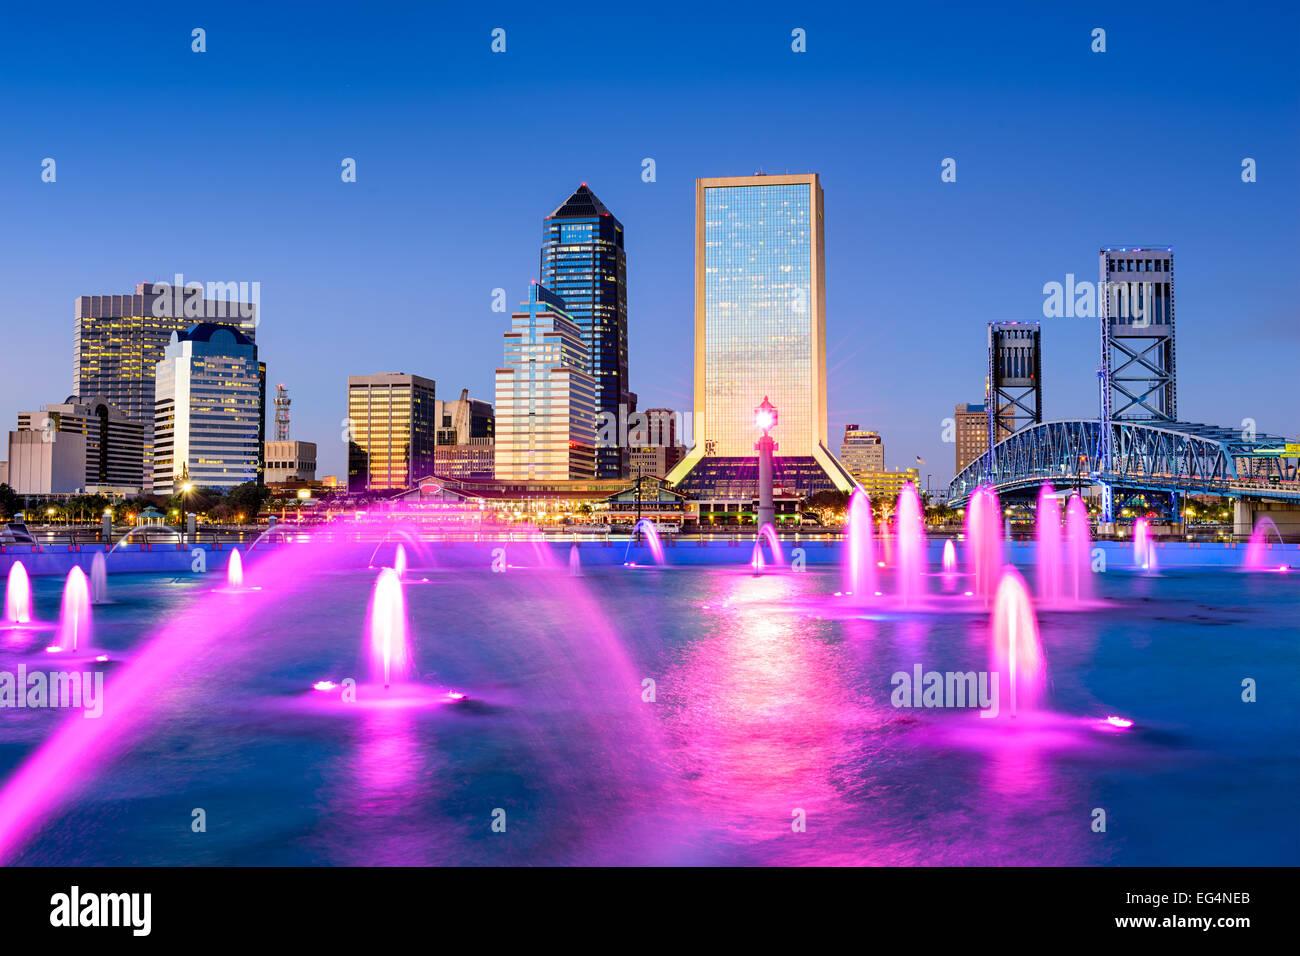 Skyline von Jacksonville, Florida, USA am Brunnen. Stockbild